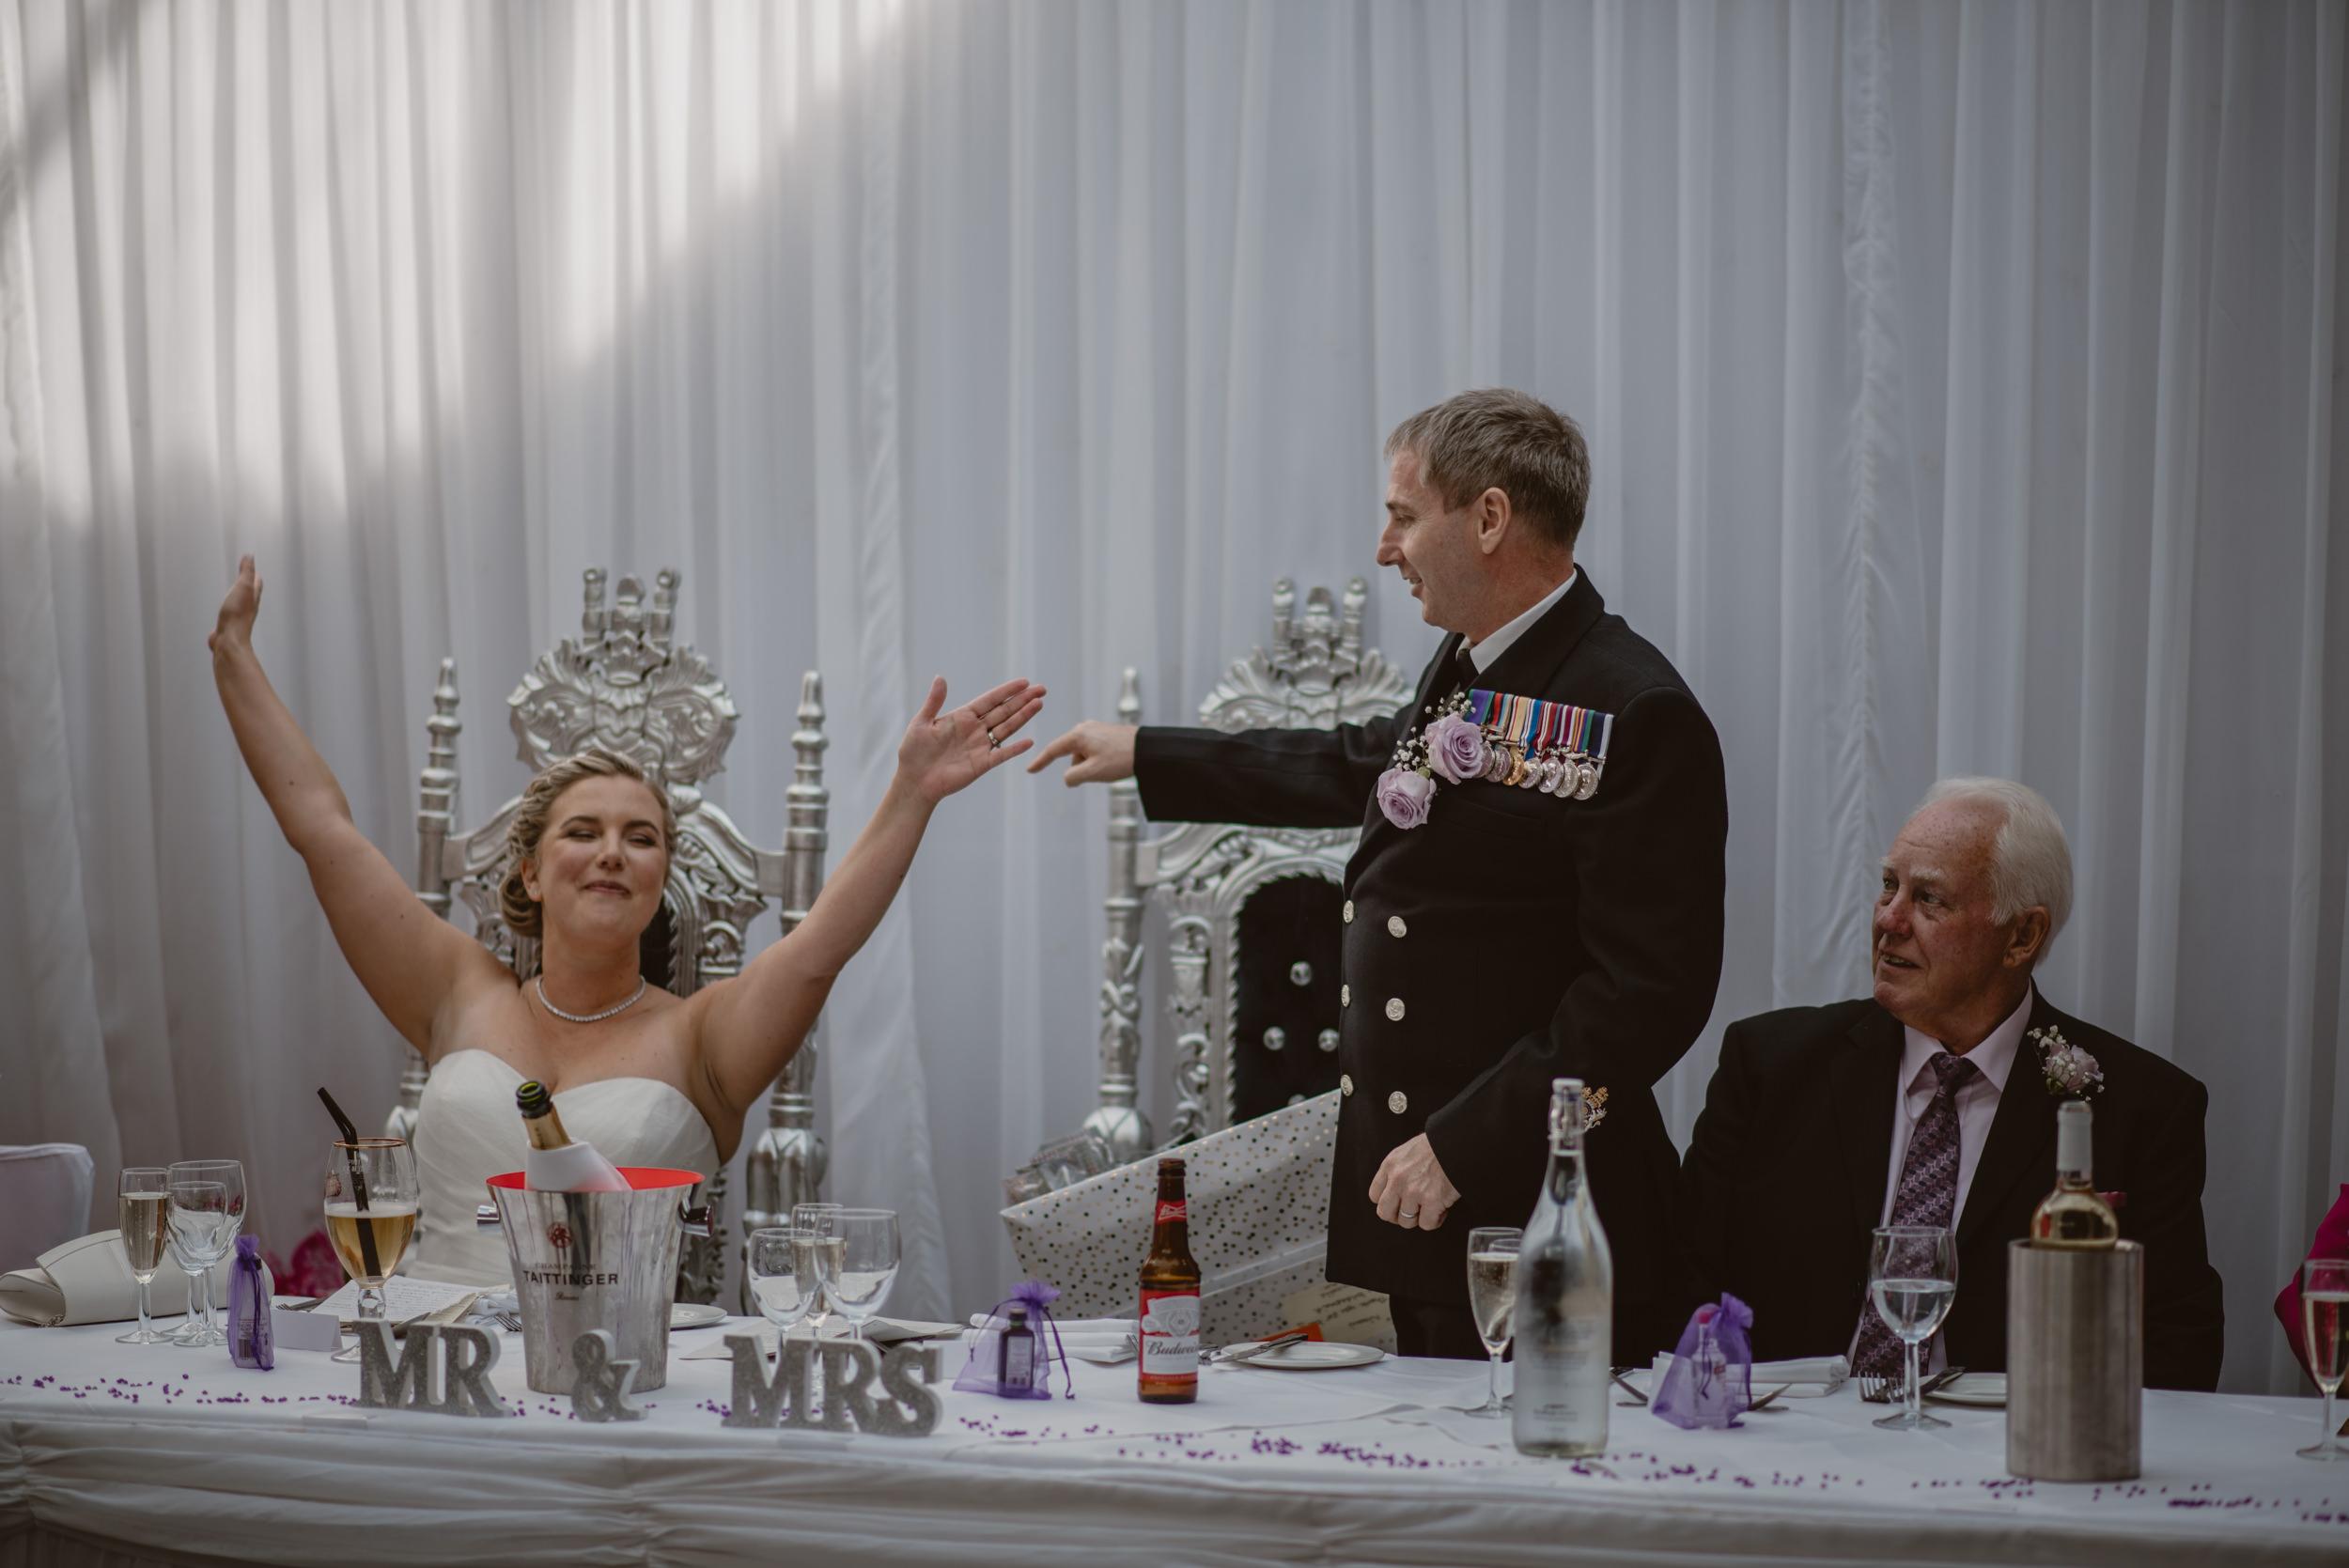 Chantelle-and-Stephen-Old-Thorns-Hotel-Wedding-Liphook-Manu-Mendoza-Wedding-Photography-358.jpg